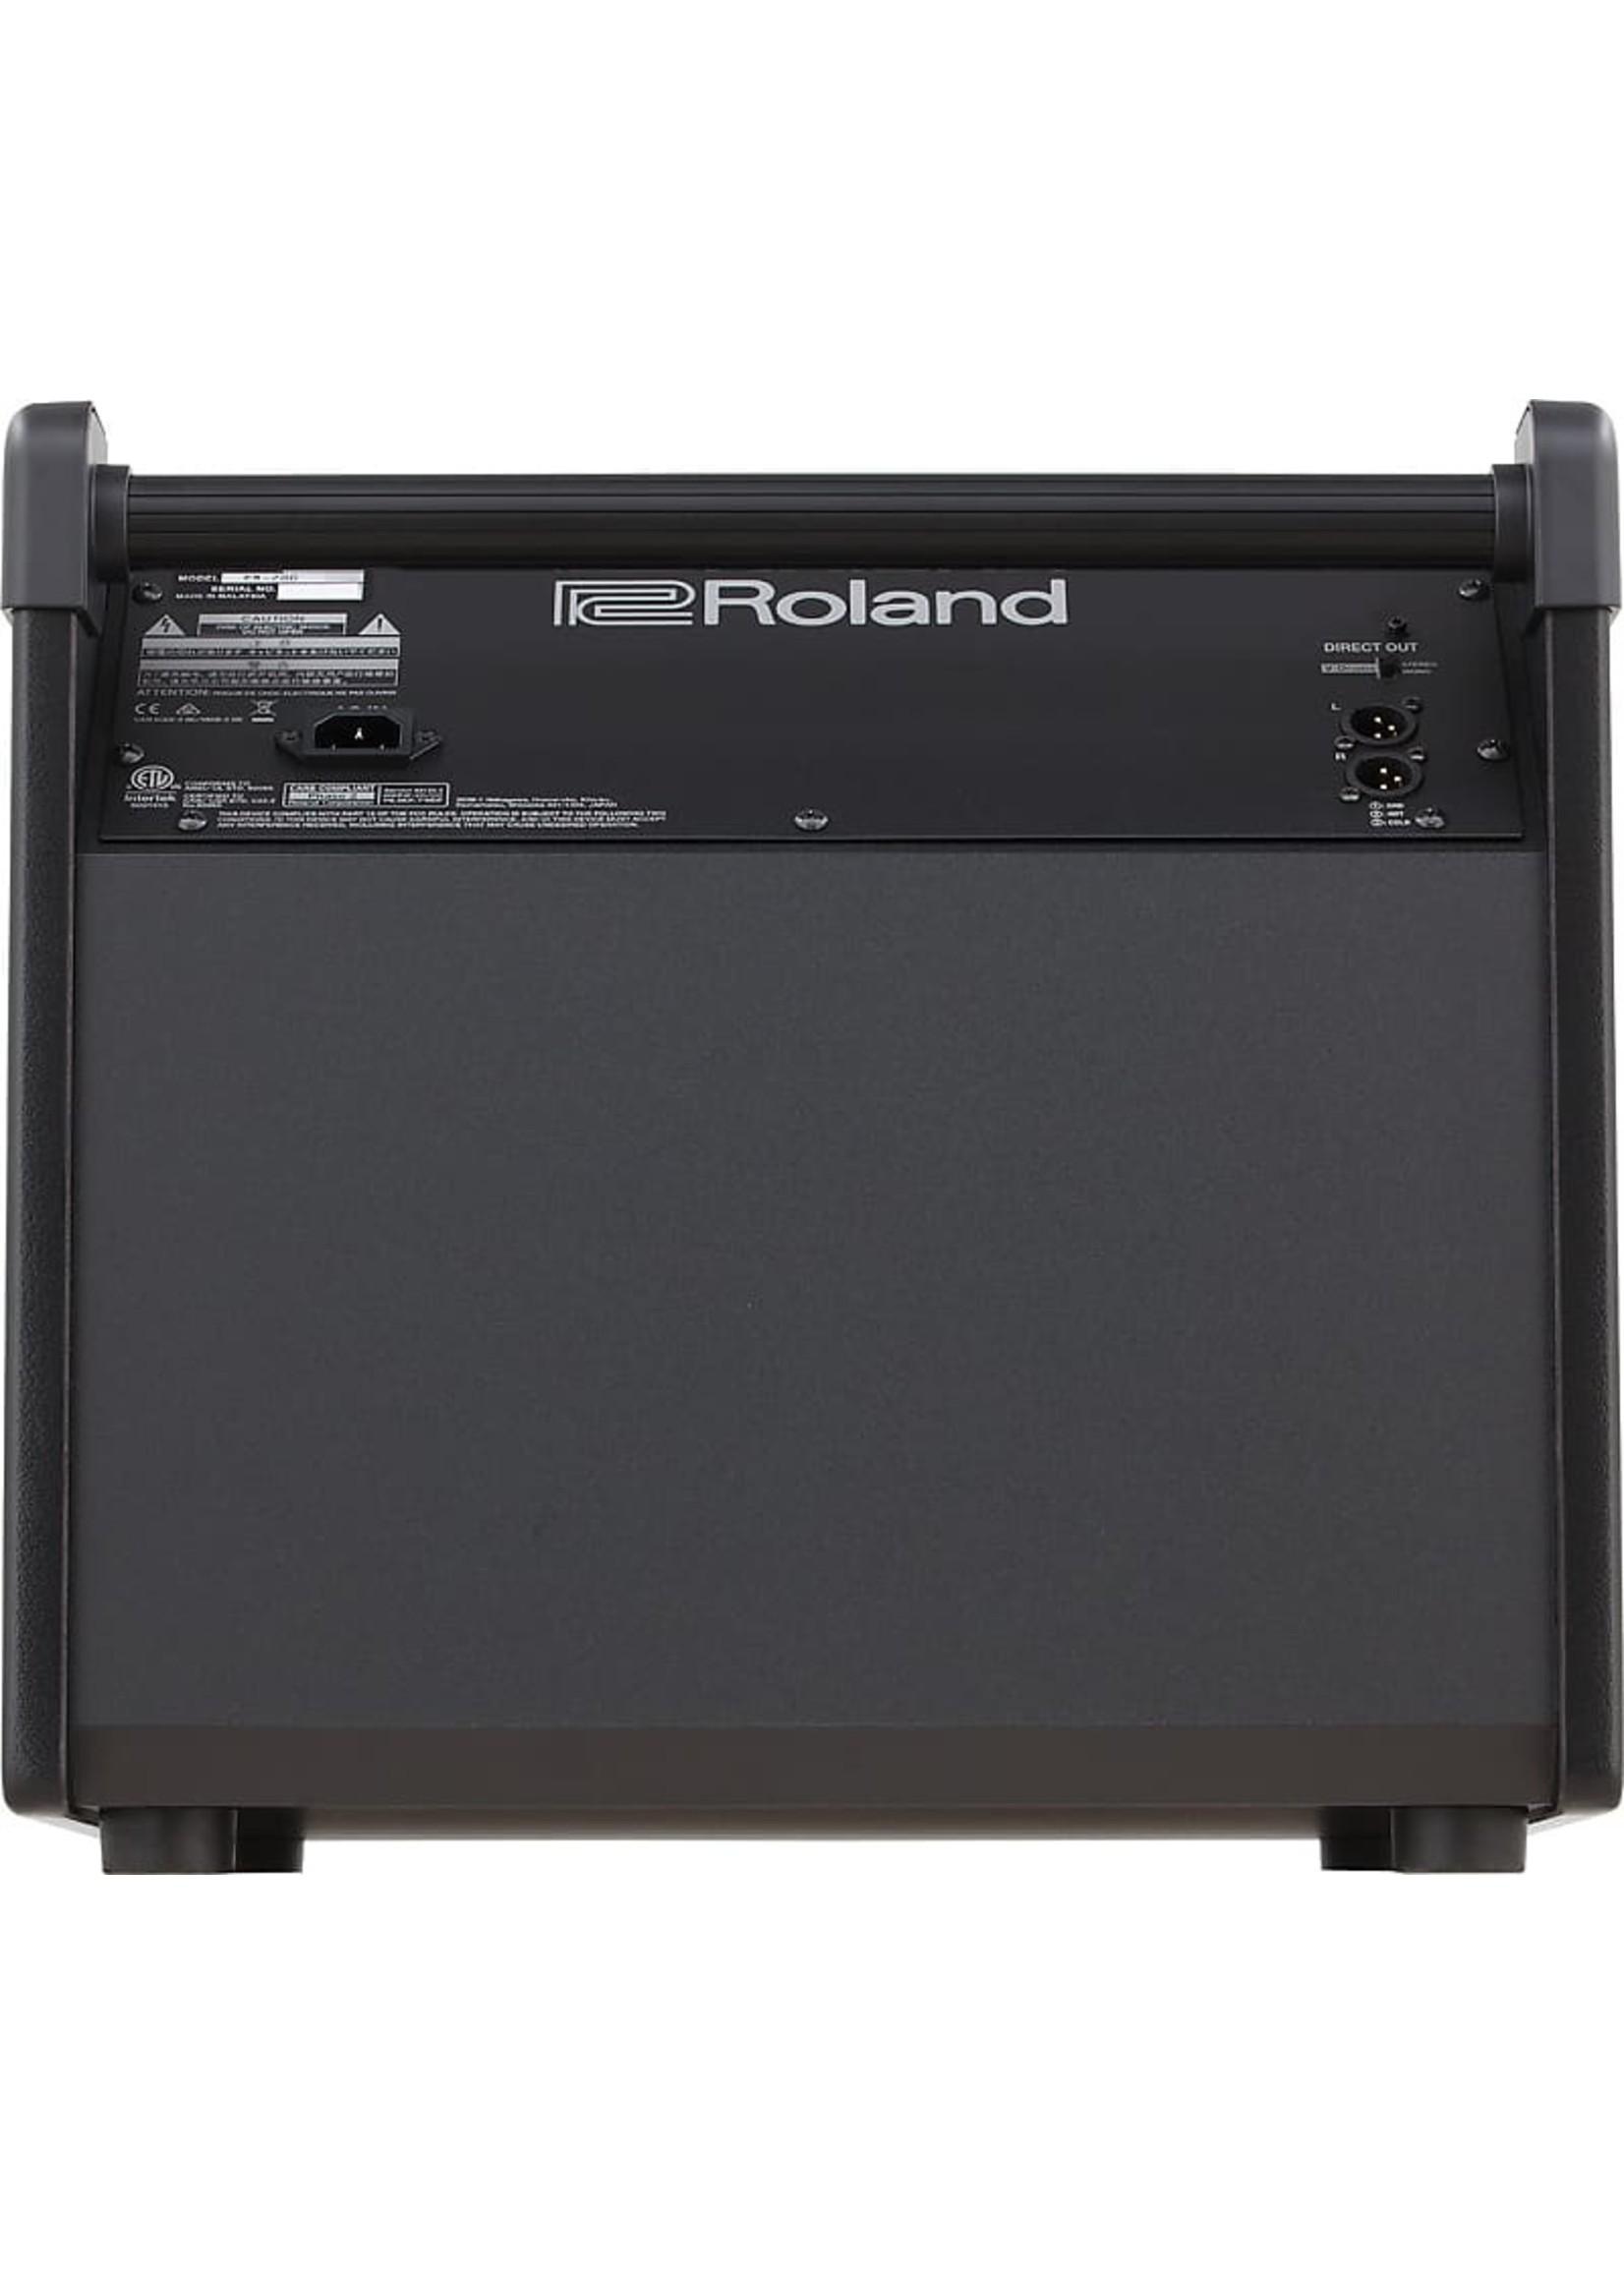 Roland Roland PM-200 Personal Drum Monitor